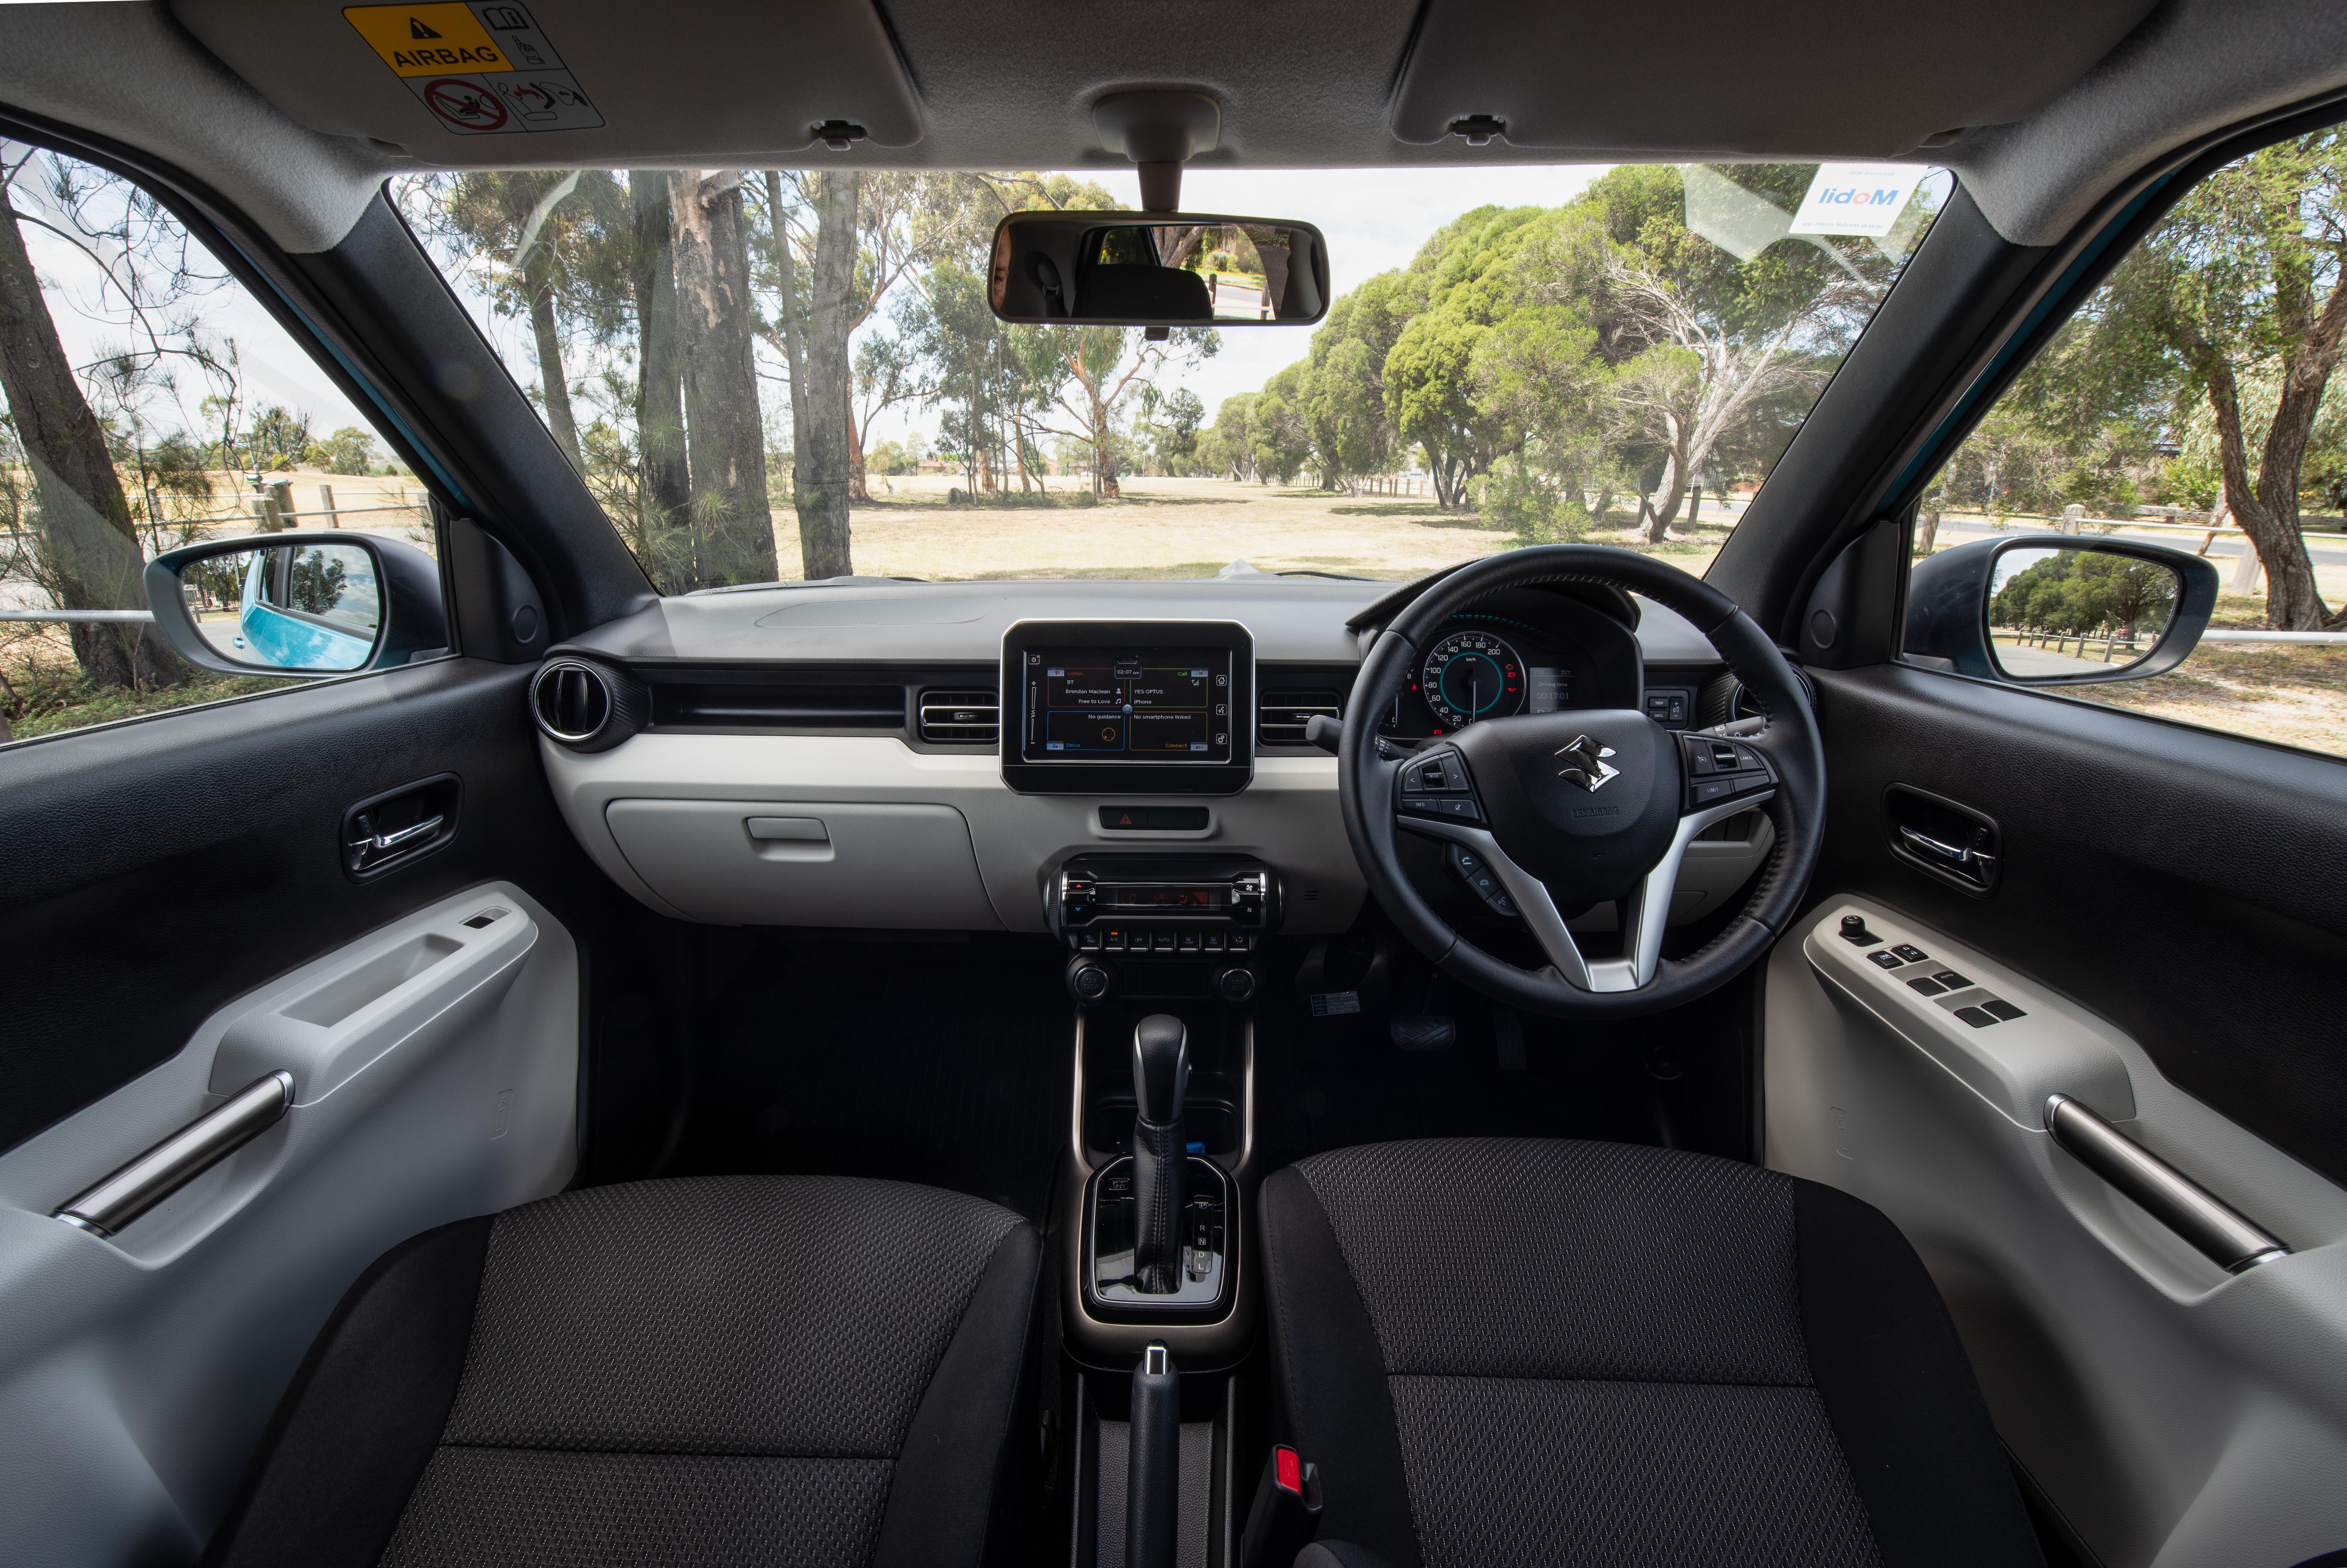 2018 Kia Picanto X-Line v Suzuki Ignis comparison | CarAdvice